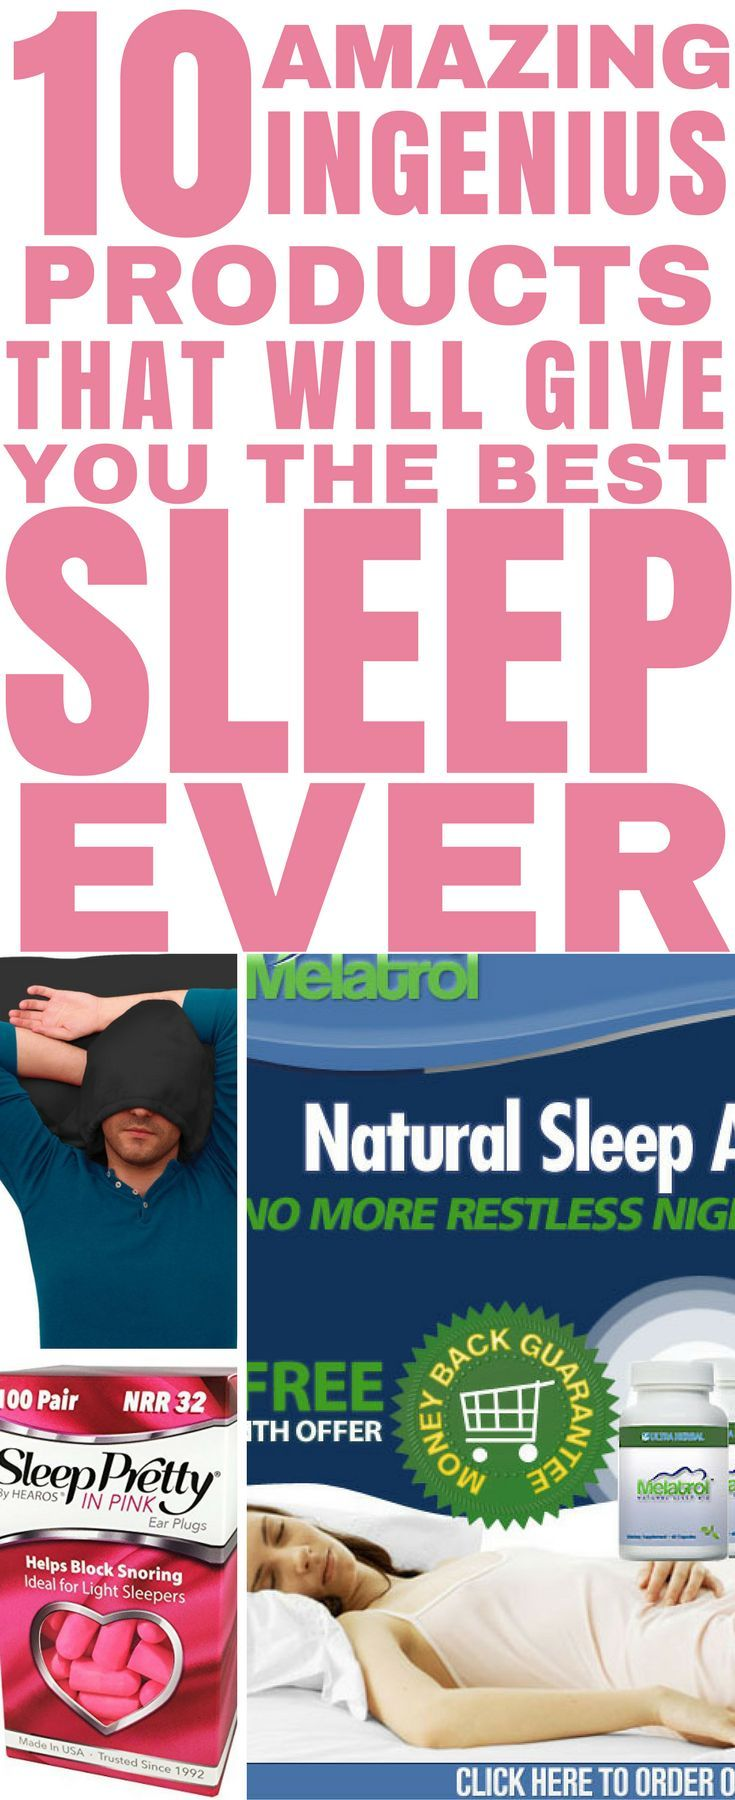 Sleep remedies | Sleep better | Sleep tips | Insomnia | Insomnia help | Help sleep better. | Better sleep.